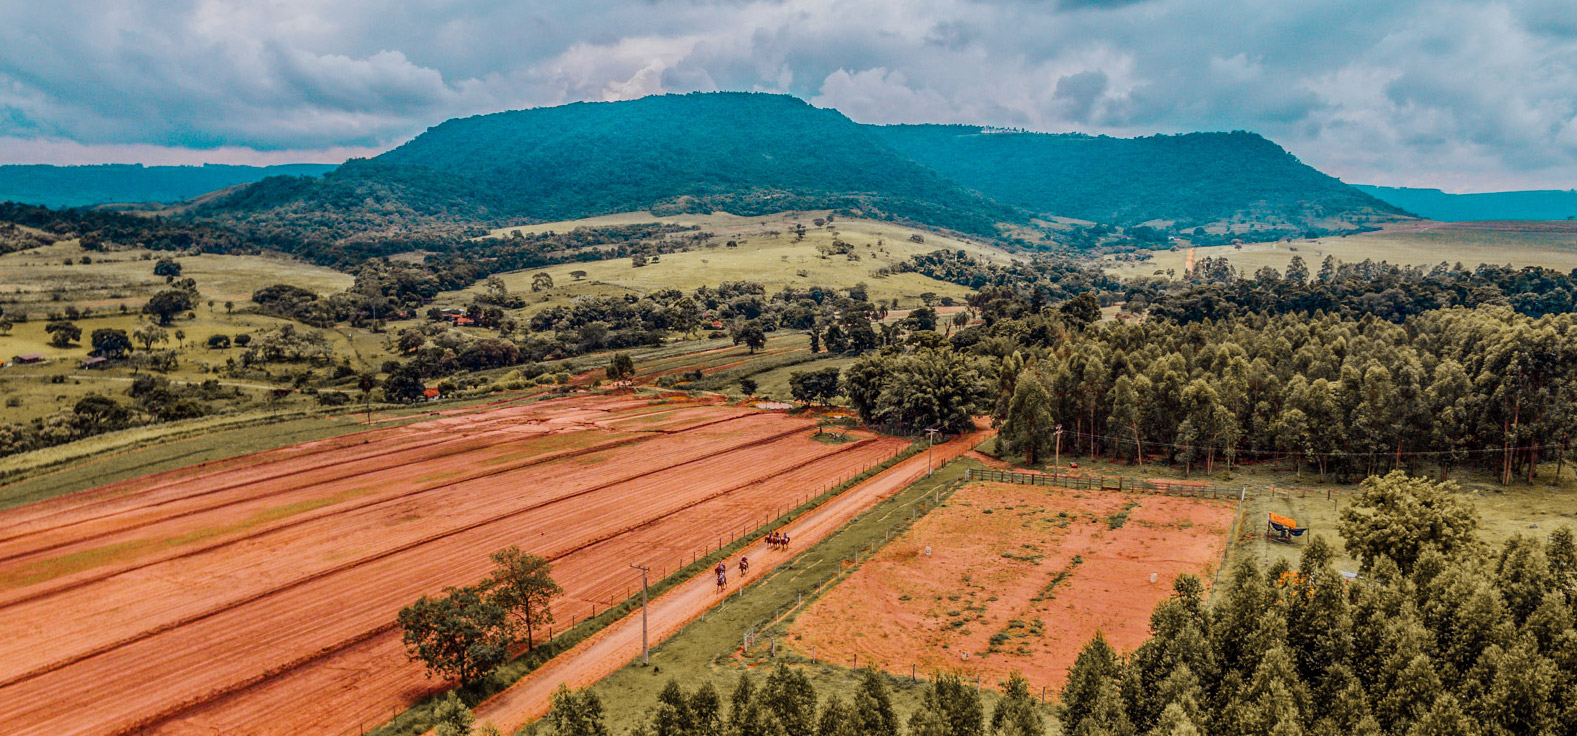 Rancho Lauro Daroz em Santa Maria da Serra | Portal Serra do Itaquerí